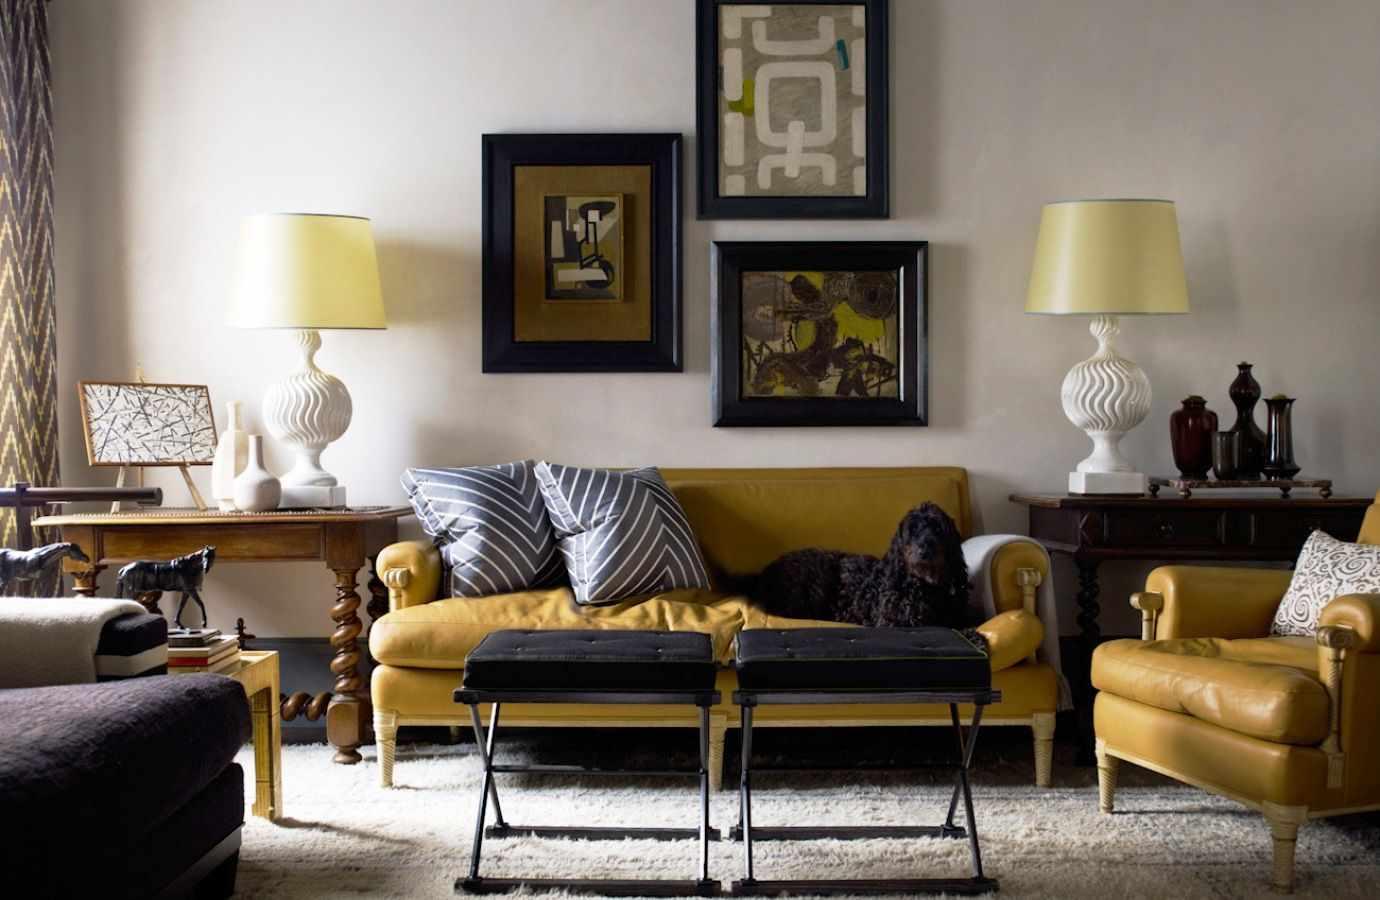 Мебель горчичного цвета